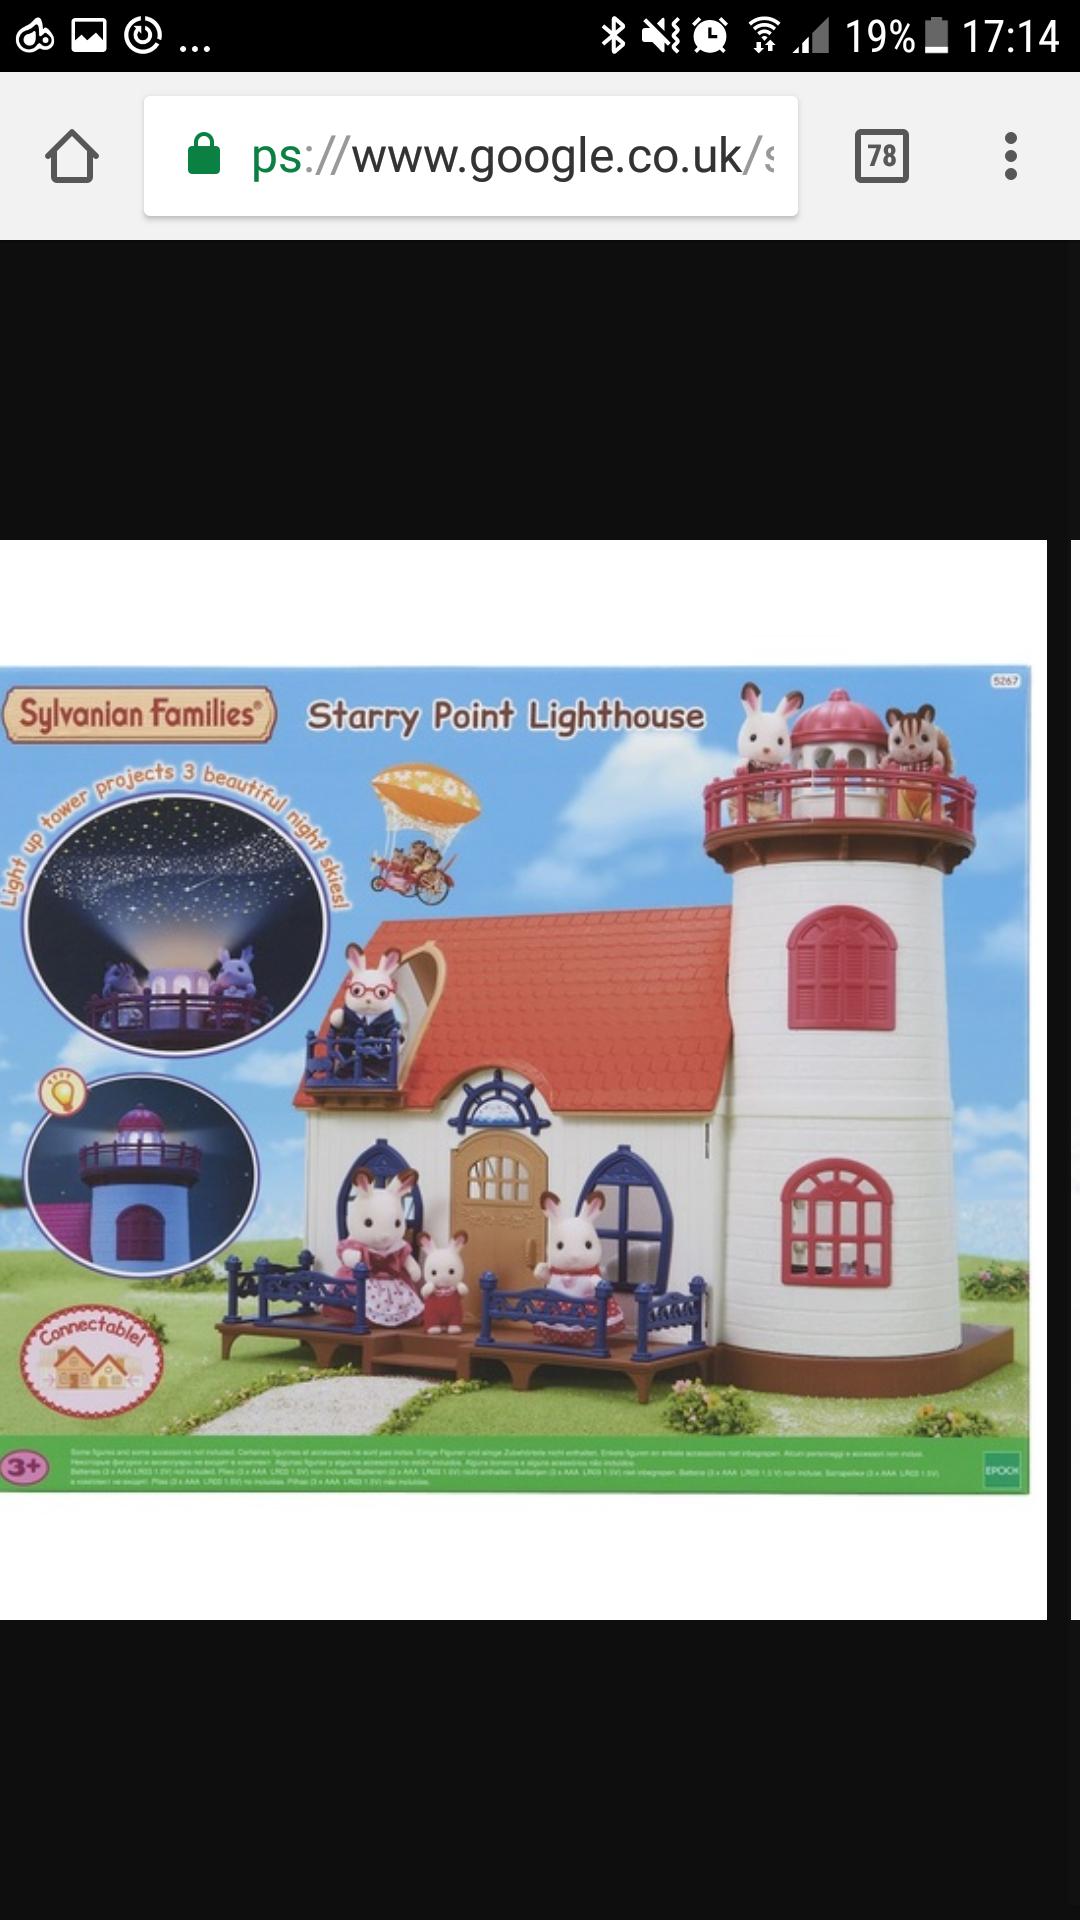 Sylvanian families Starry Point lighthouse £34.99 @ Smyths sale